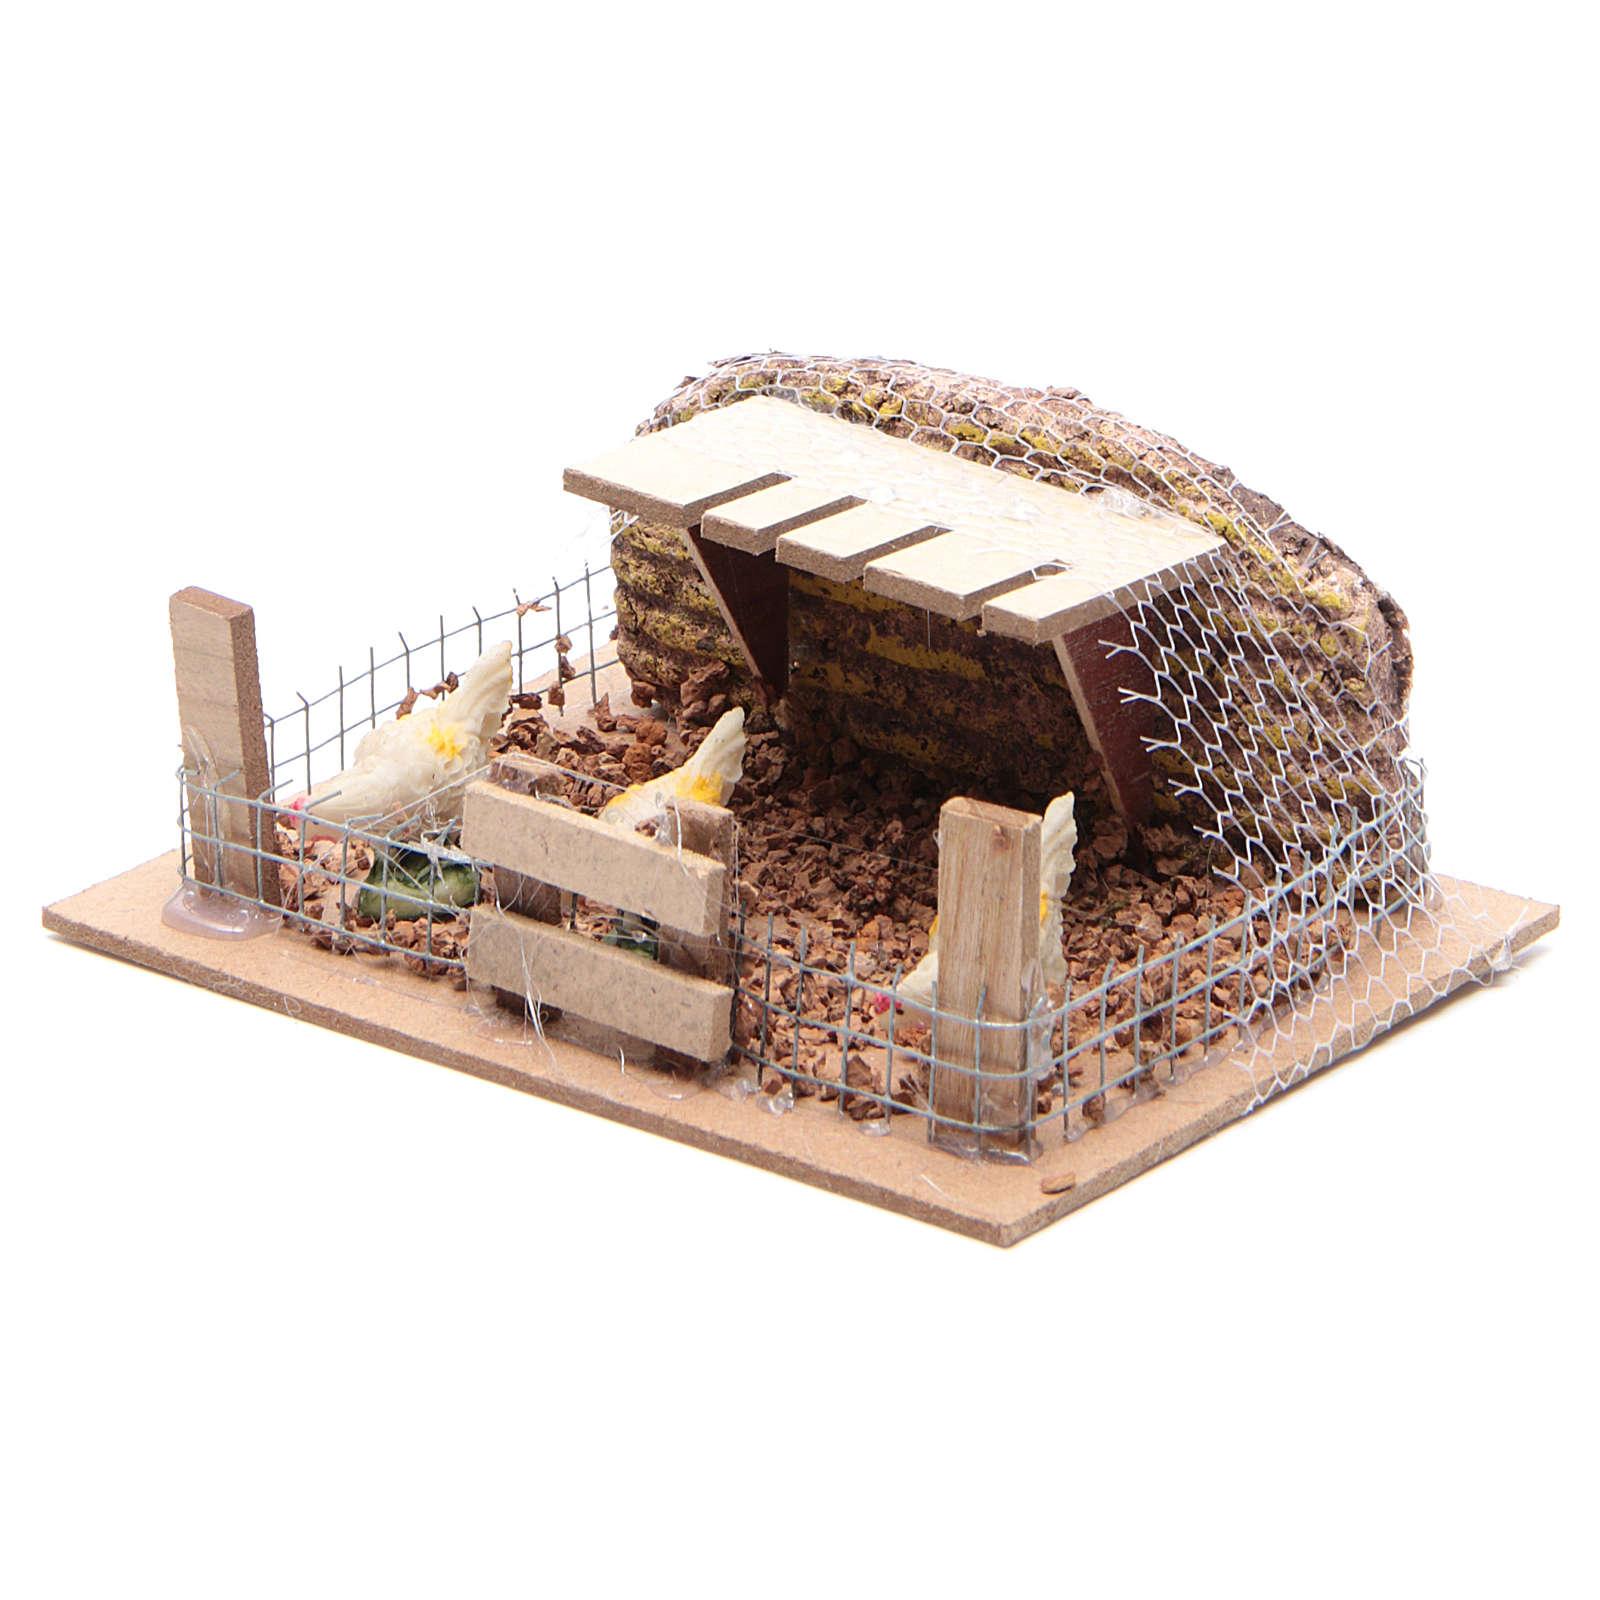 Corral con gallinas 6x14,5x11 cm para belén 3